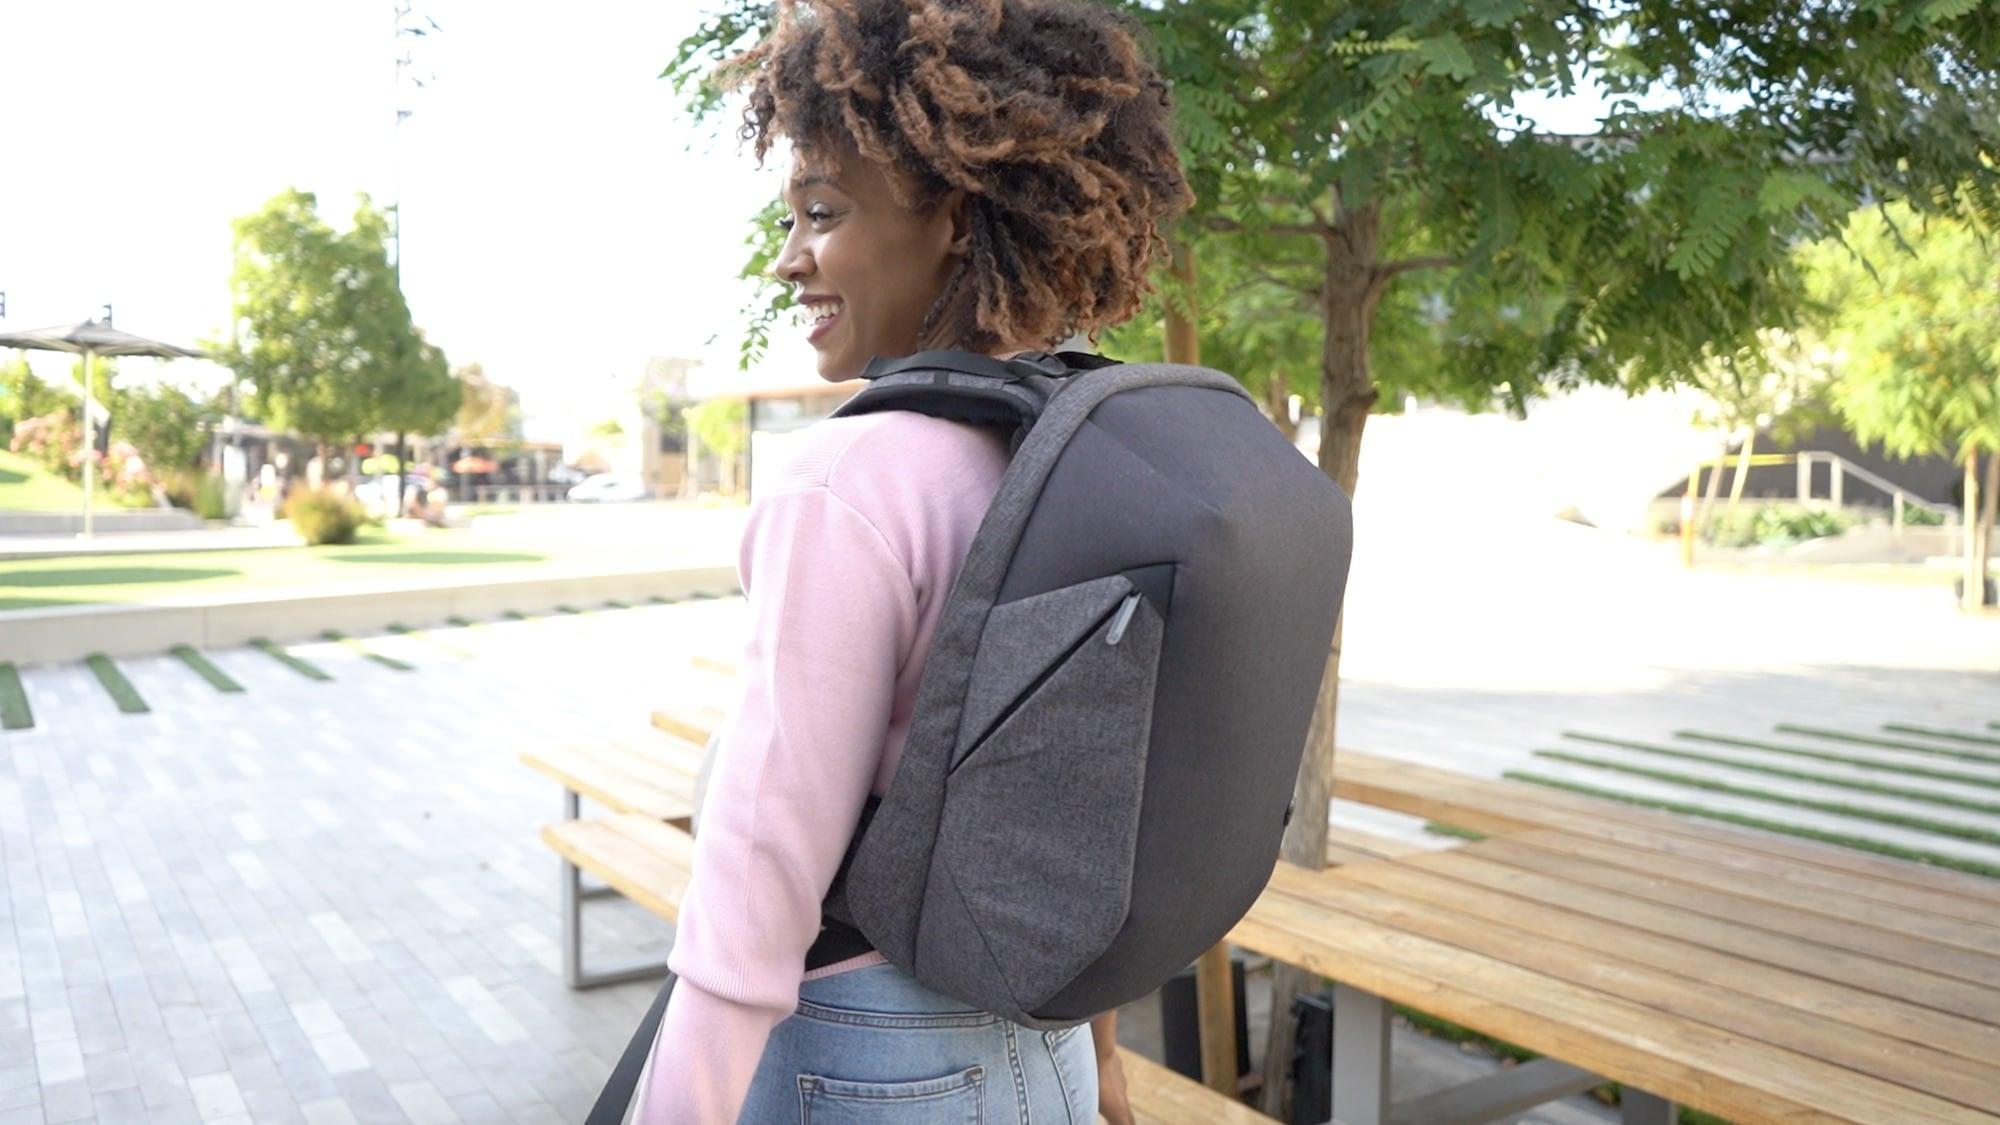 Swissdigital Design Cosmo 3.0 Massaging Backpack